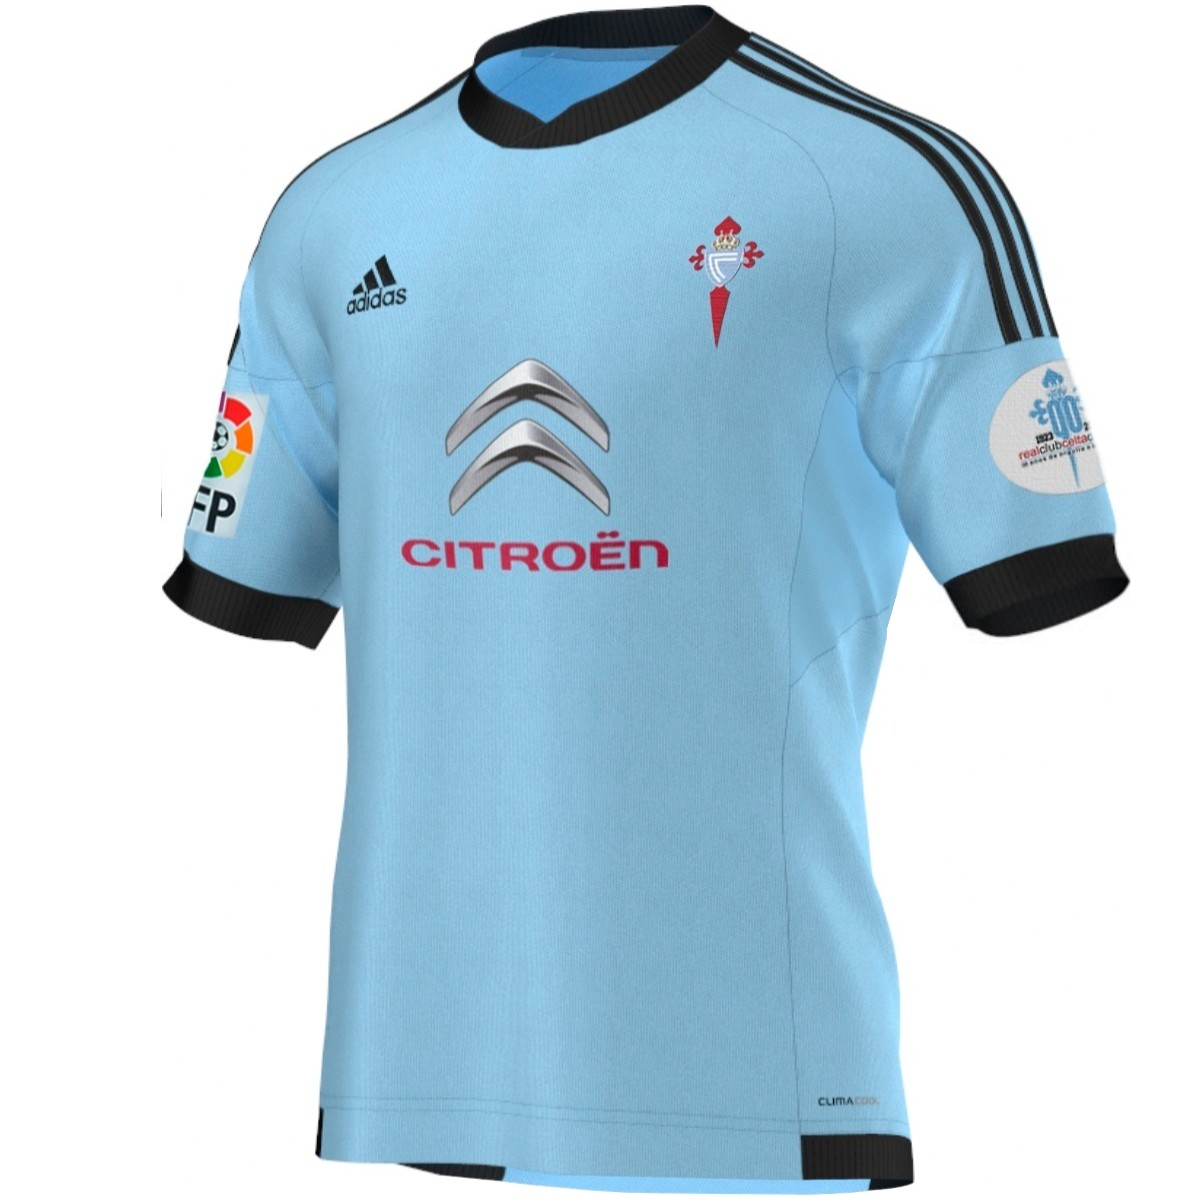 Maillot de foot Celta Vigo domicile 201314 Adidas SportingPlus Passion for Sport